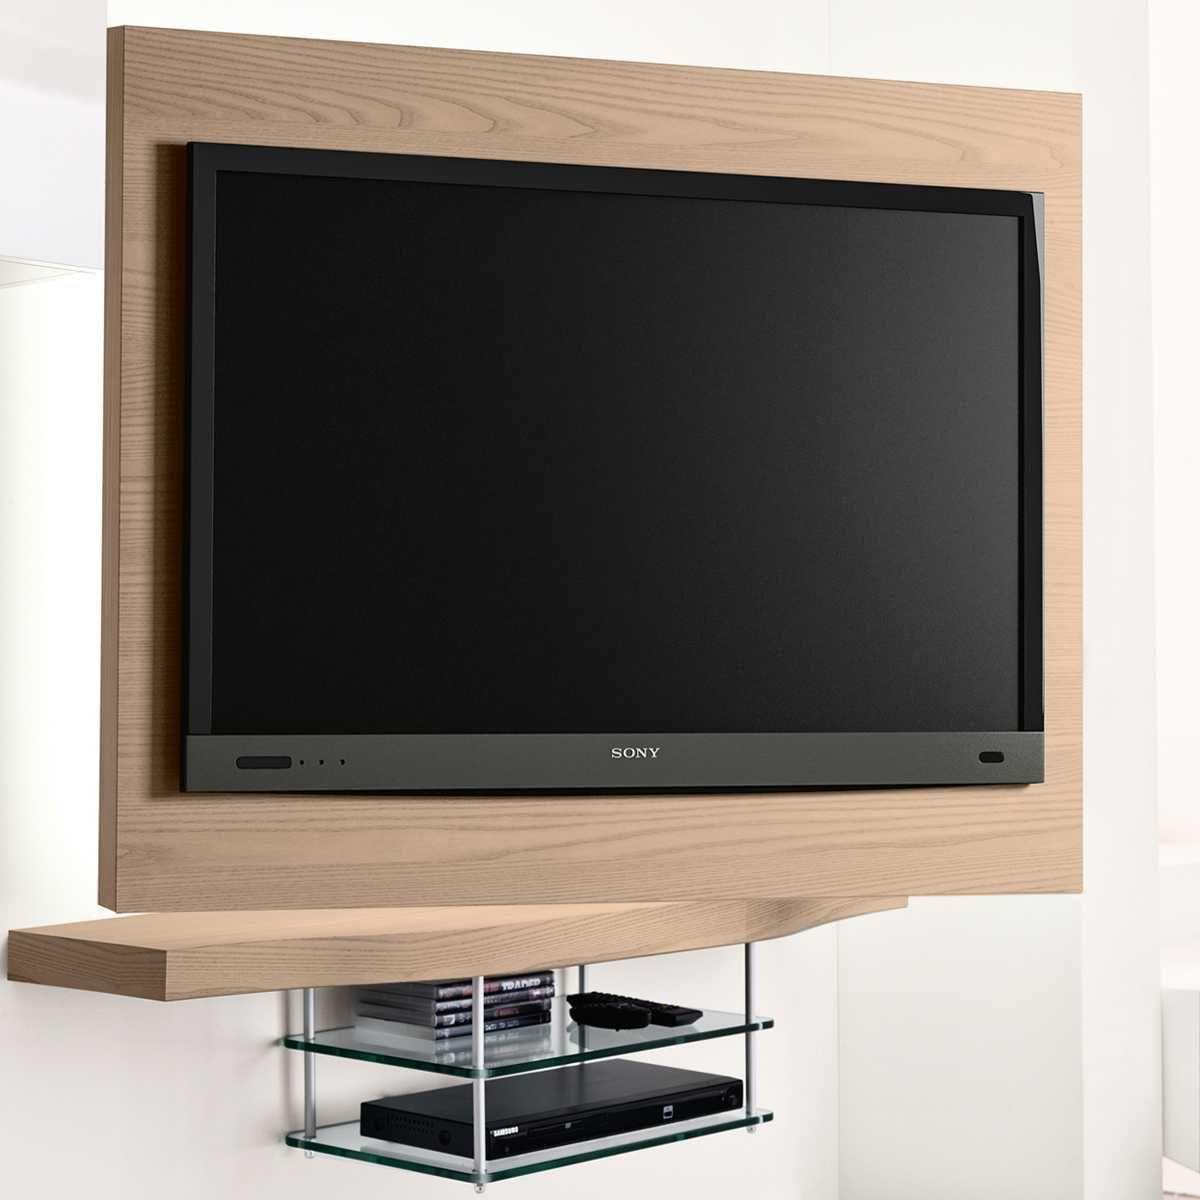 Logic Schwenkbarer Tv Rack Mit Led Hinterleuchtung Diotti Com Tv Halterung Glasboden Led